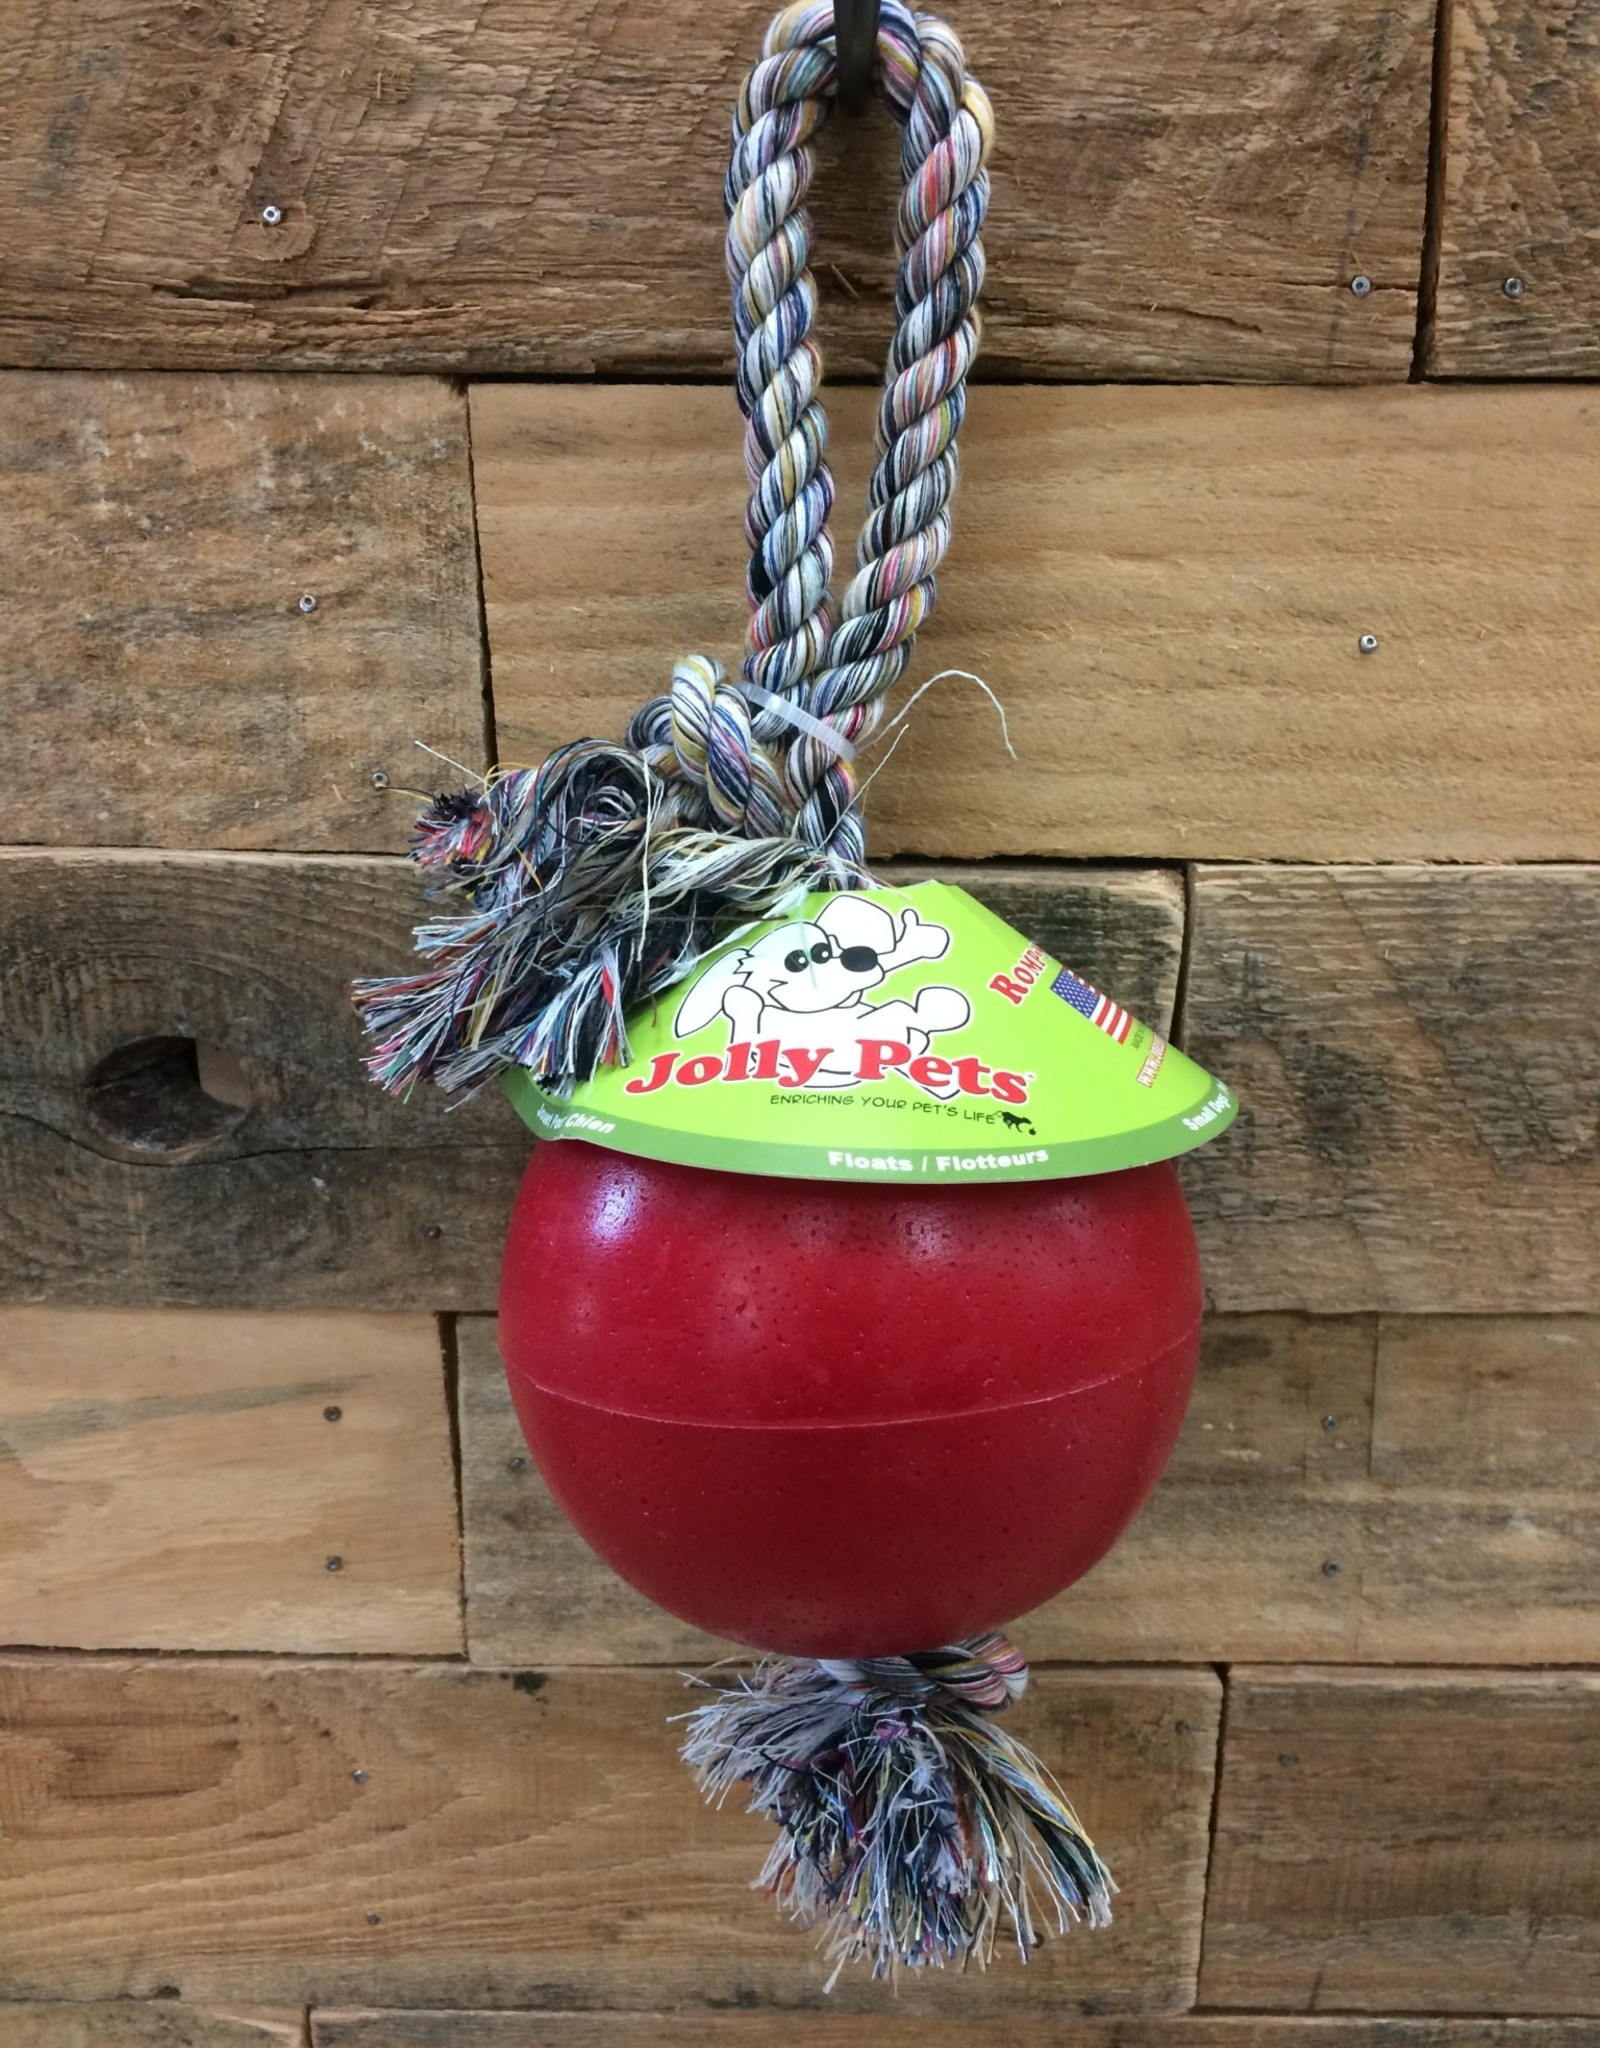 "JOLLY PETS ROMP-N-ROLL JOLLY BALL - RED 4.5"""